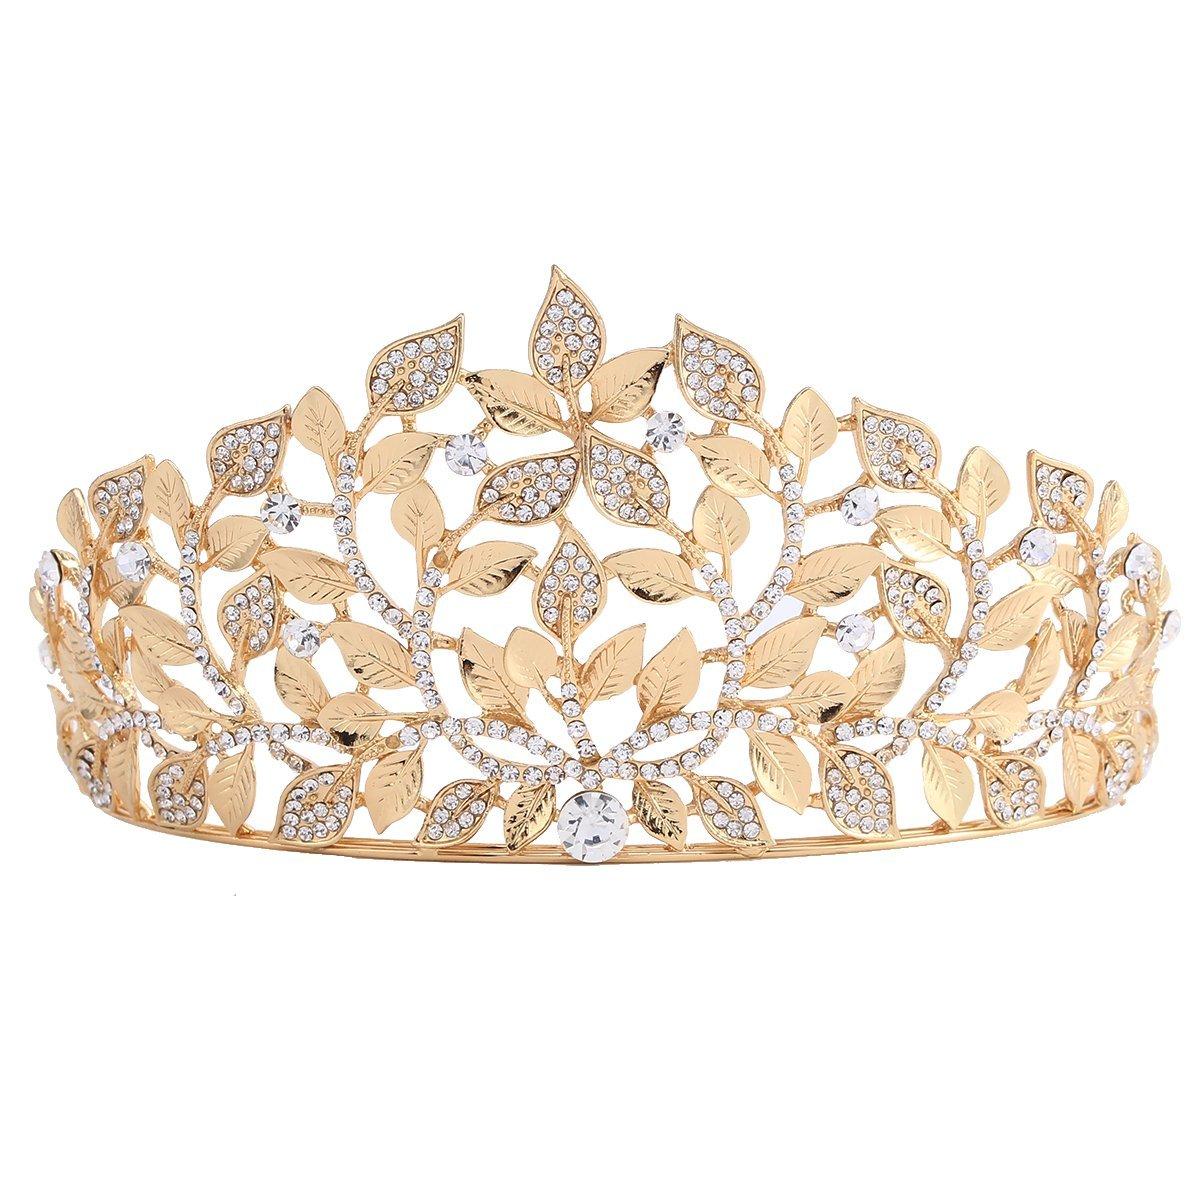 Santfe Rhinestones Crystal Tree Leaf Style Bridal Tiara Crown Headband Prom Wedding Hair Jewelry (Gold-A)